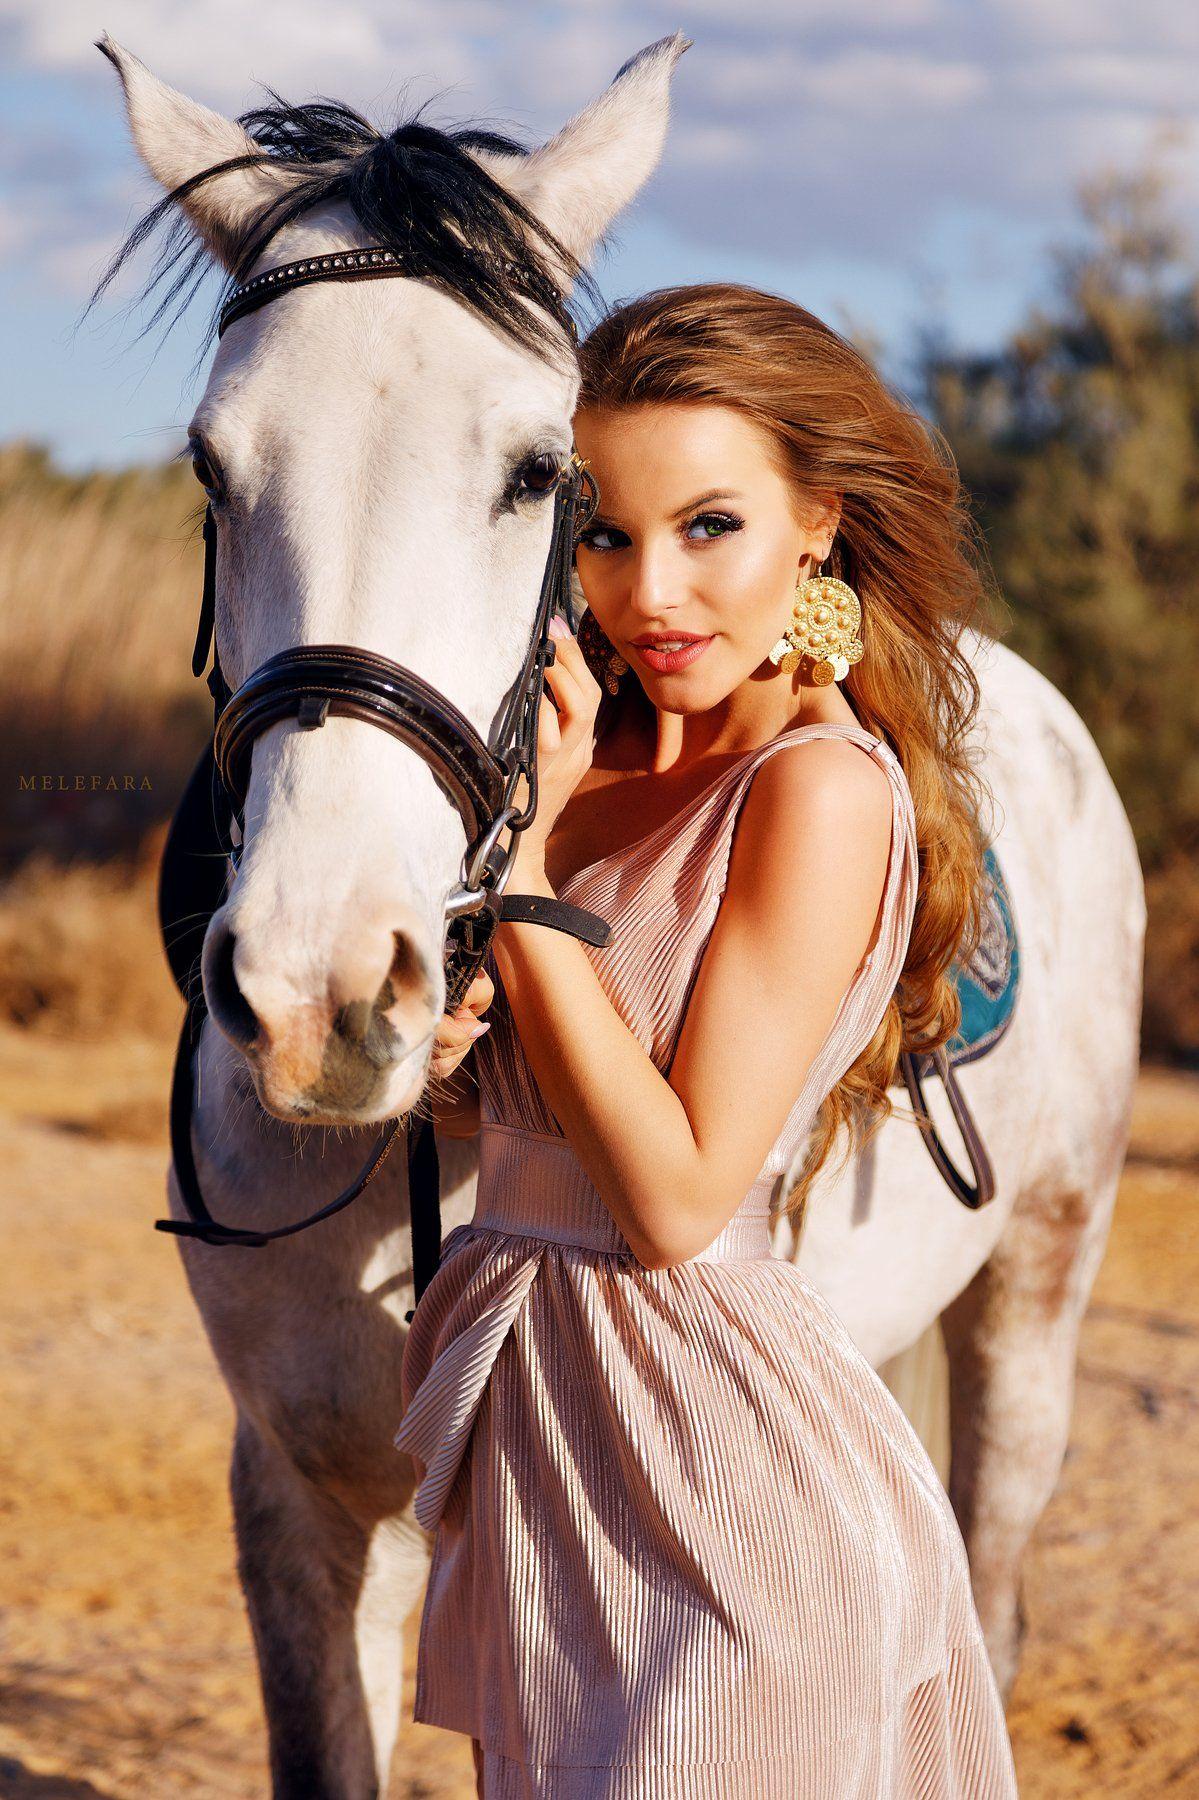 horse, лошадки , девушка, красотка , природа , жизнь, Сергей Мелефара